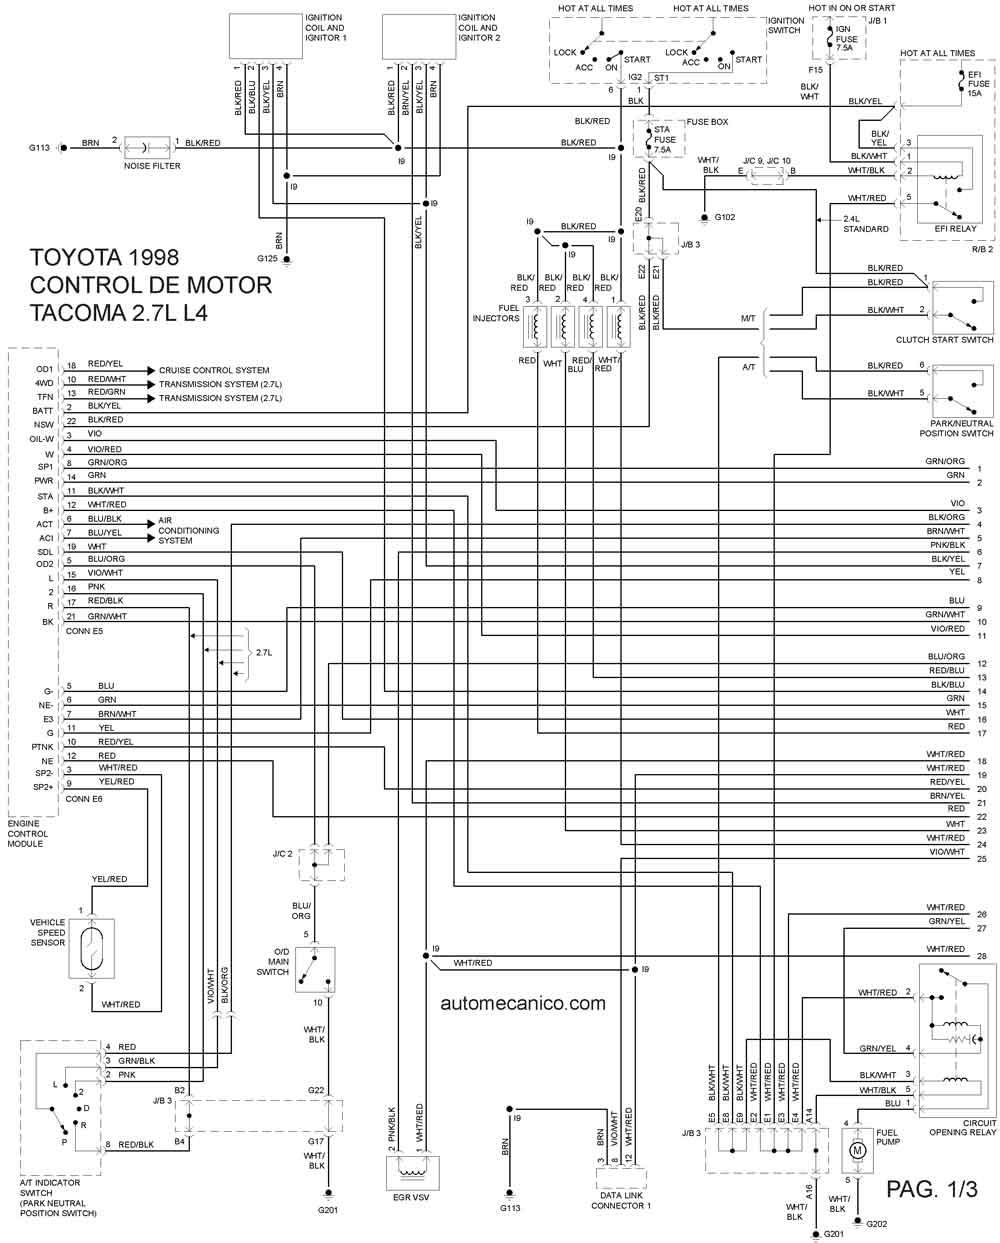 [DIAGRAM] Toyota Corolla 86 Diagrama Computadora FULL